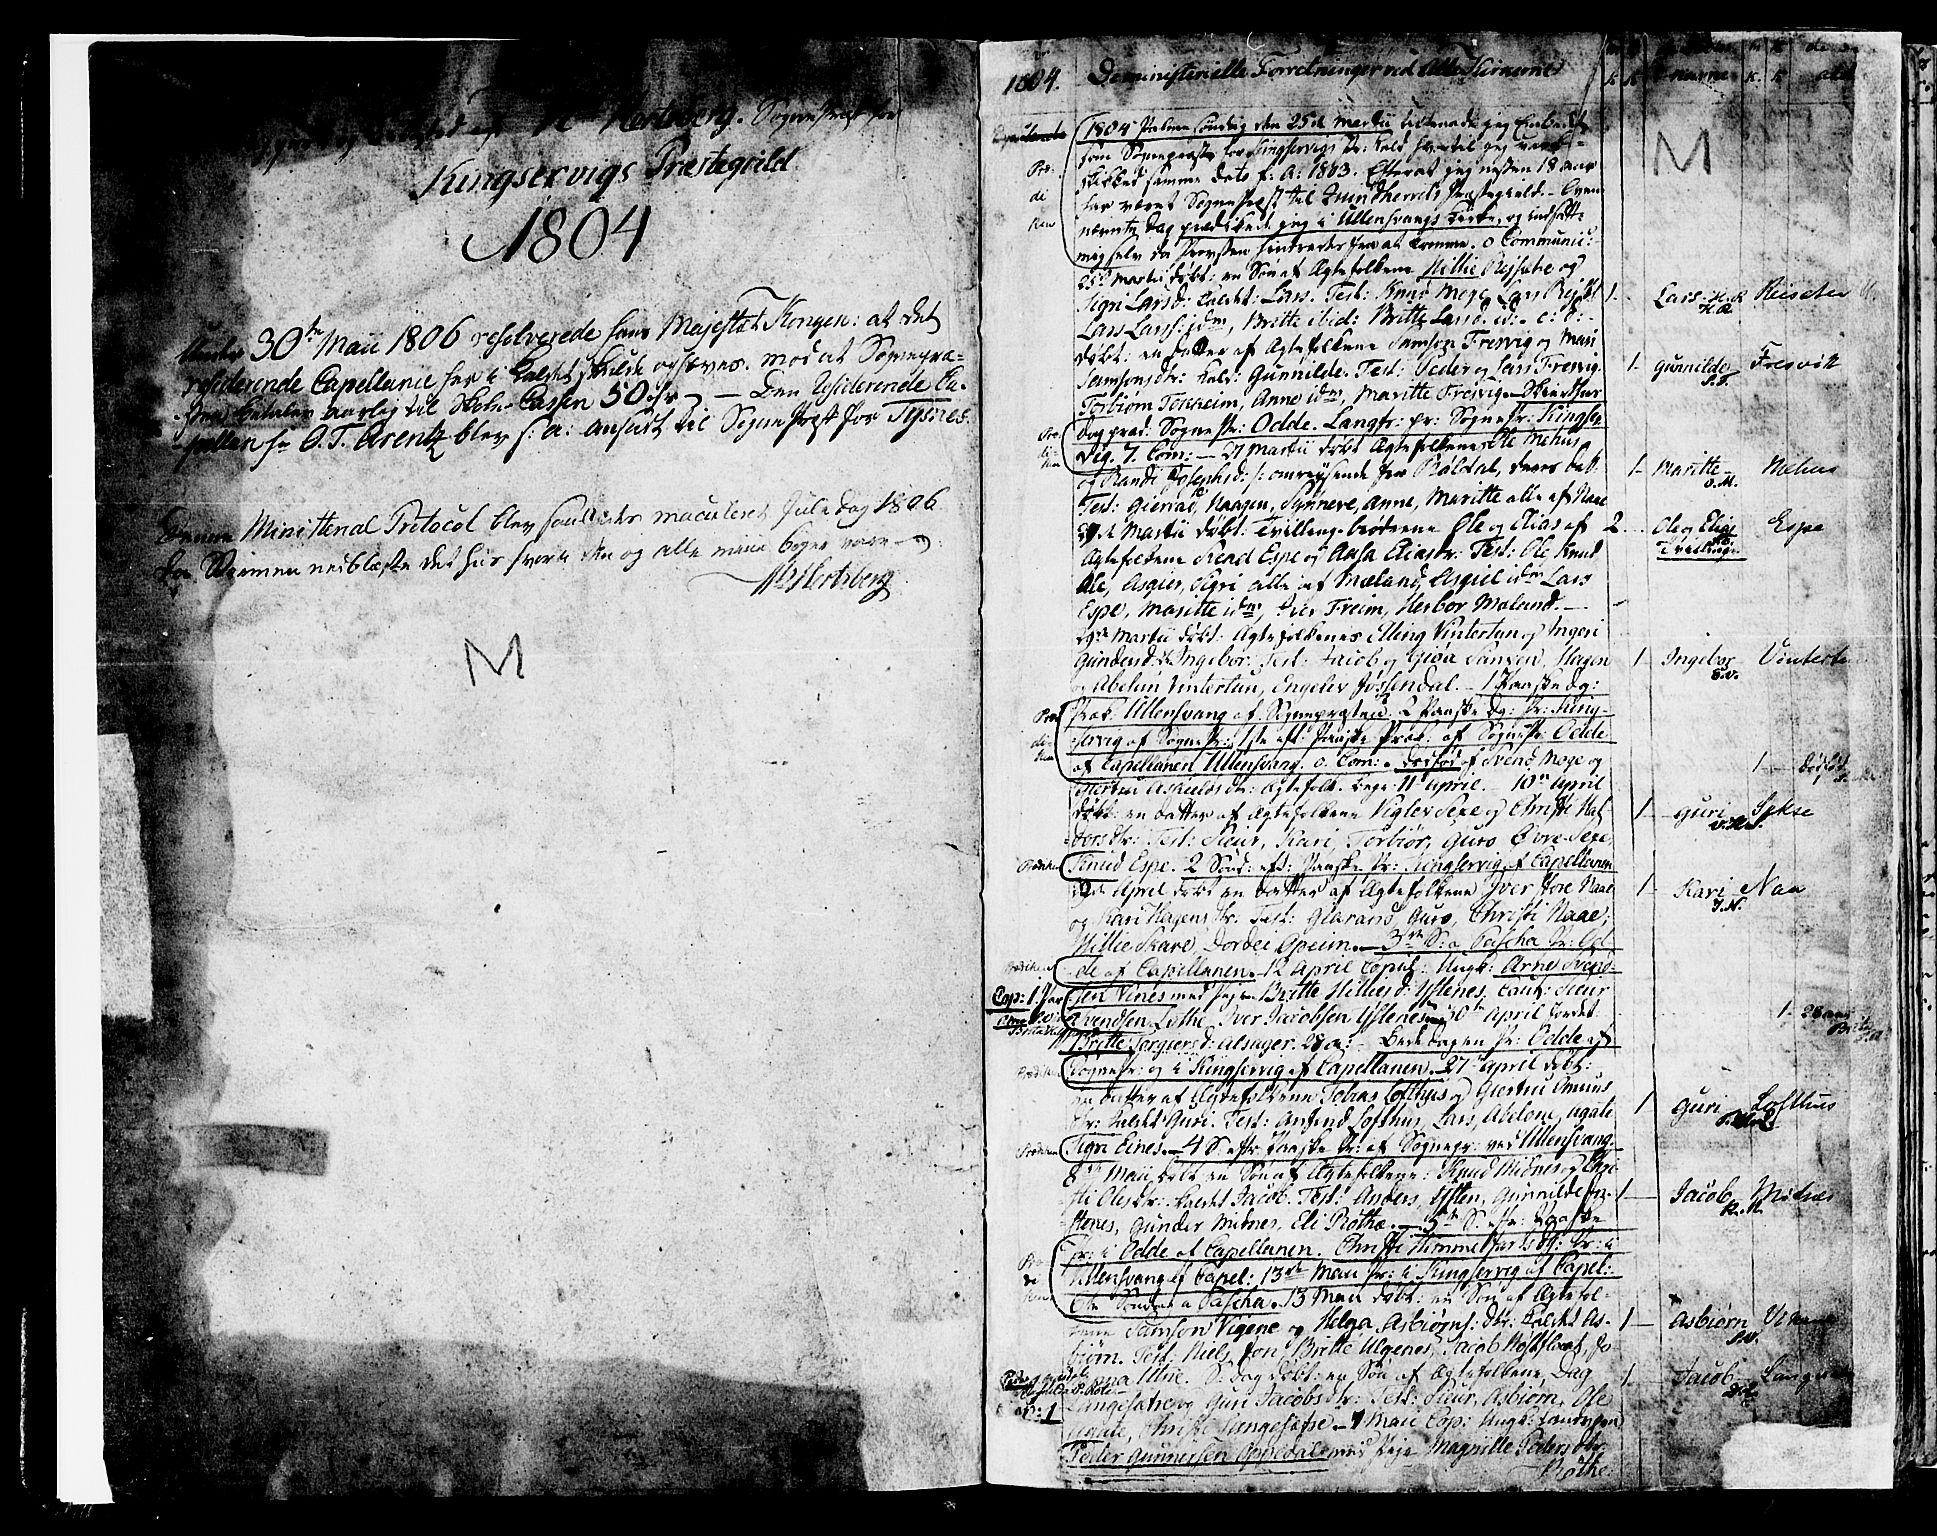 SAB, Ullensvang Sokneprestembete, H/Haa: Ministerialbok nr. A 8, 1804-1835, s. 1